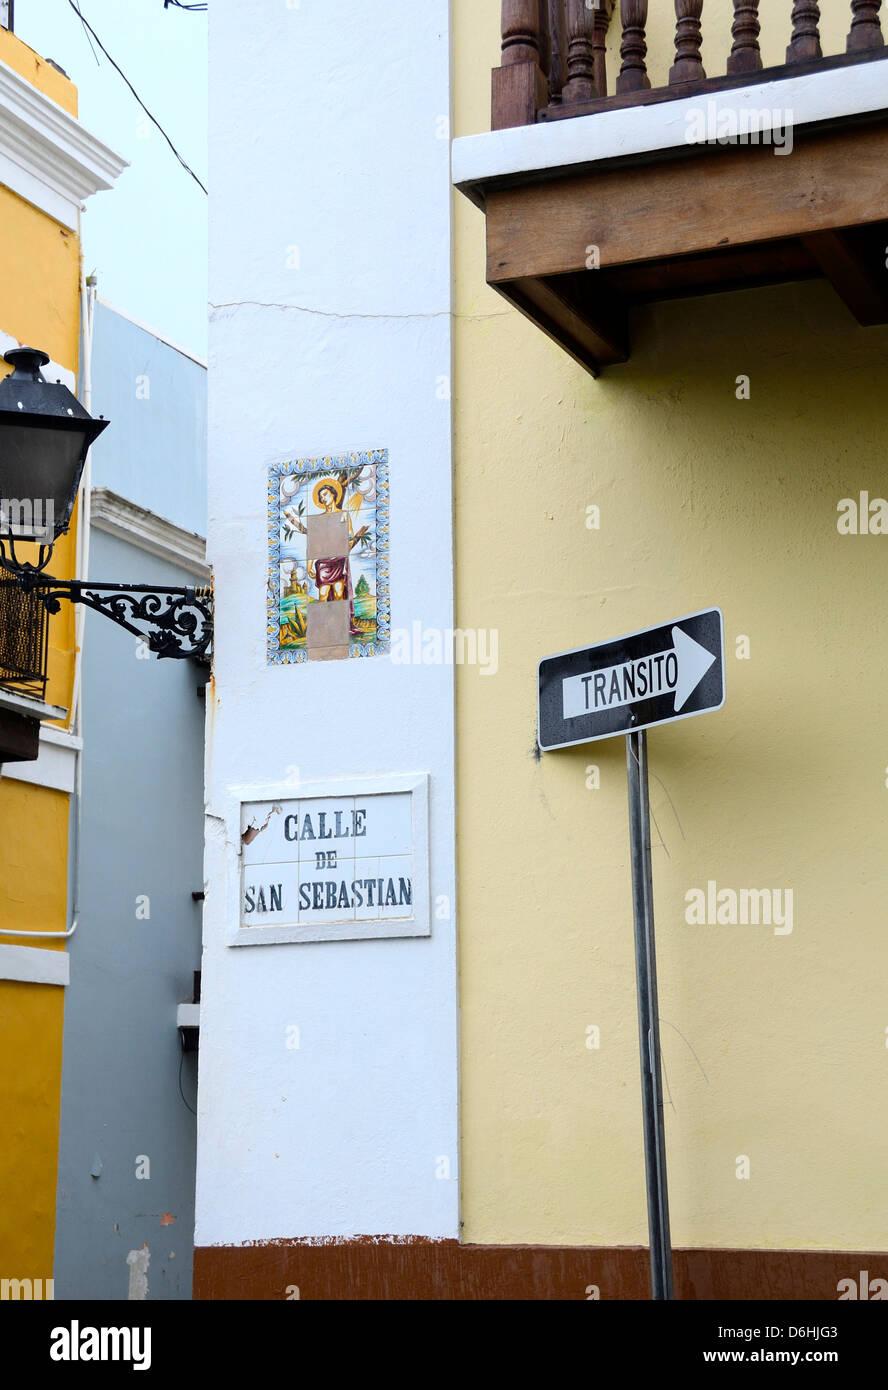 Street signs in Old San Juan, Puerto Rico - Stock Image